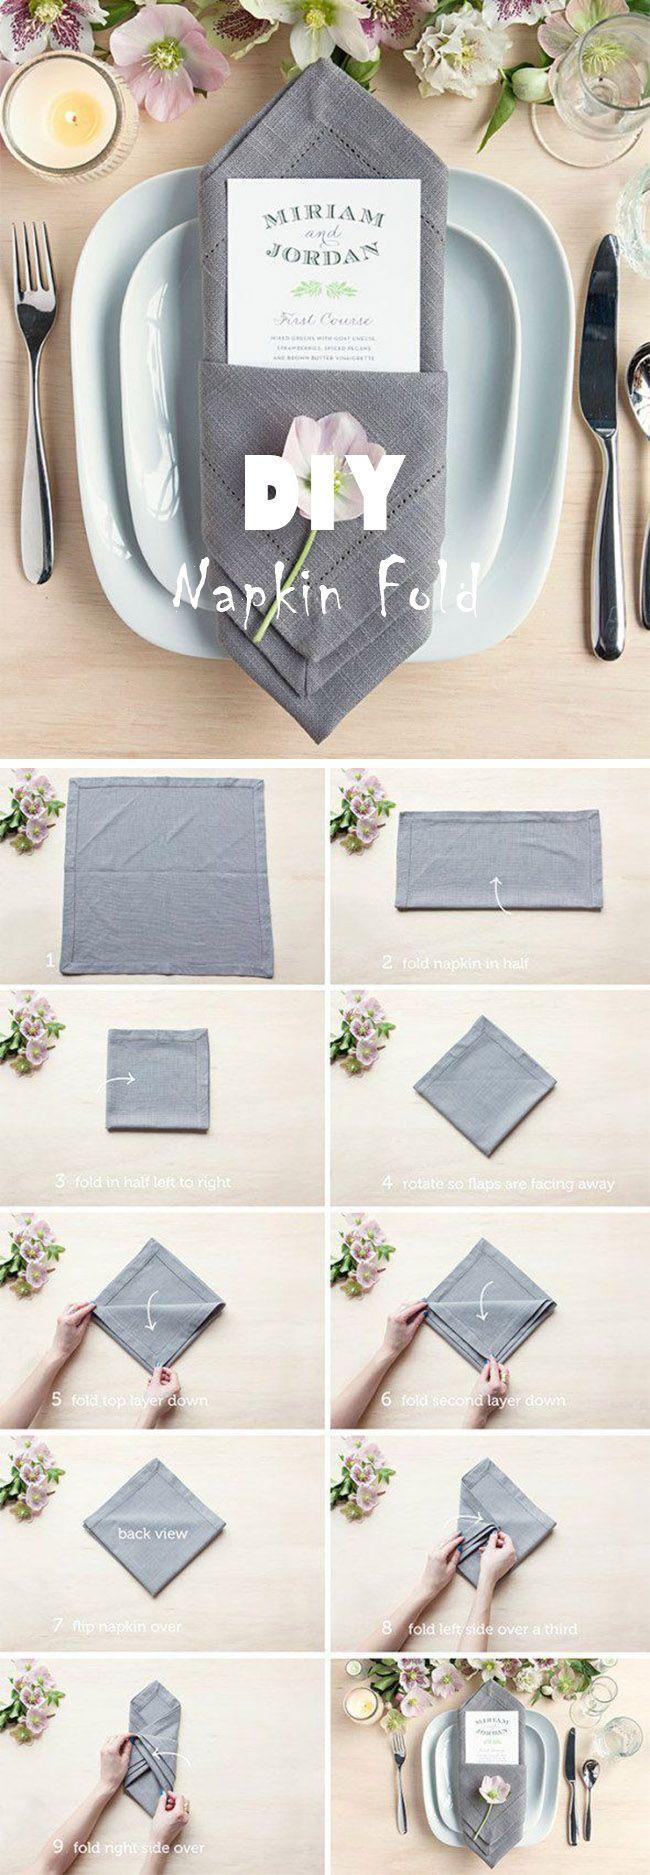 Wedding - 10 Useful DIY Wedding Ideas With Tutorials